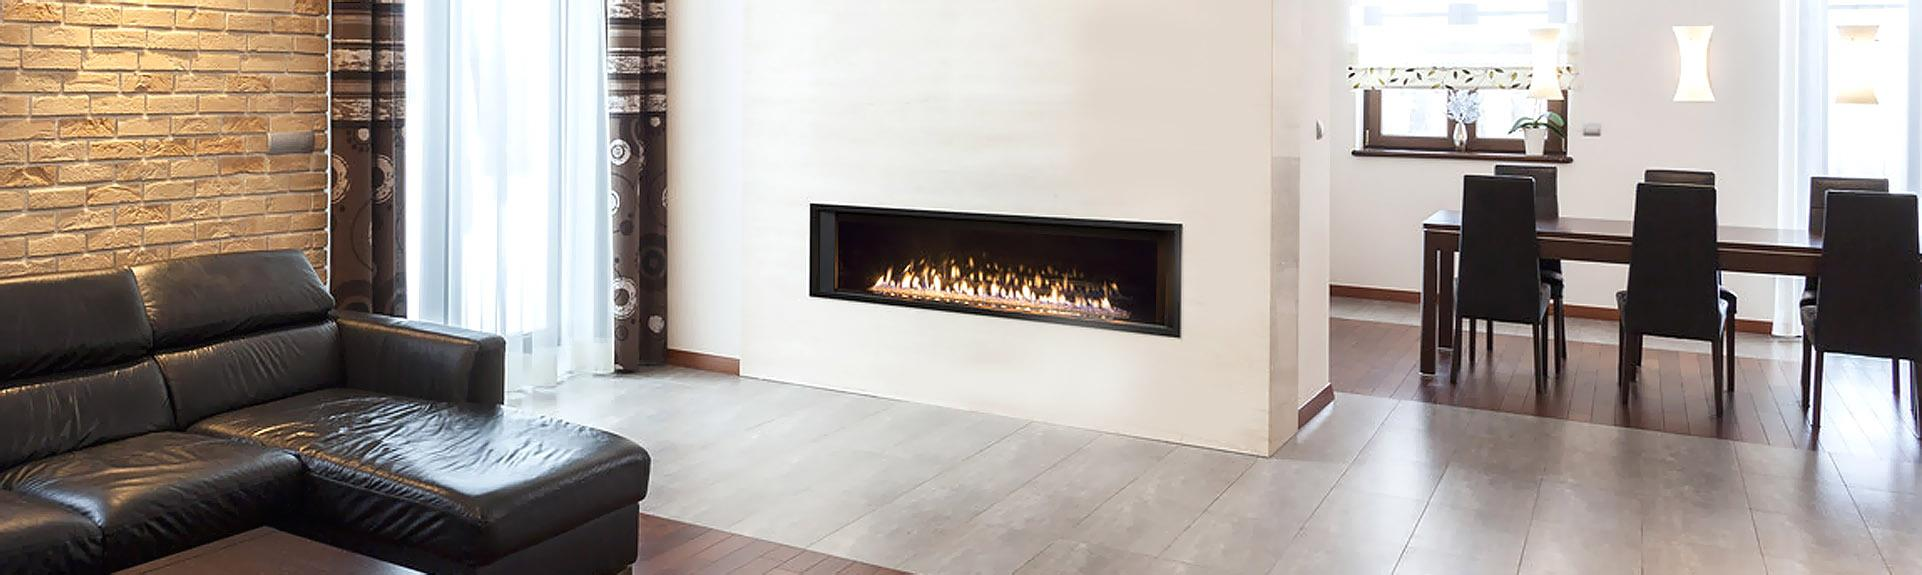 fireplace faqs wood stove fireplace center rh woodstovenj com